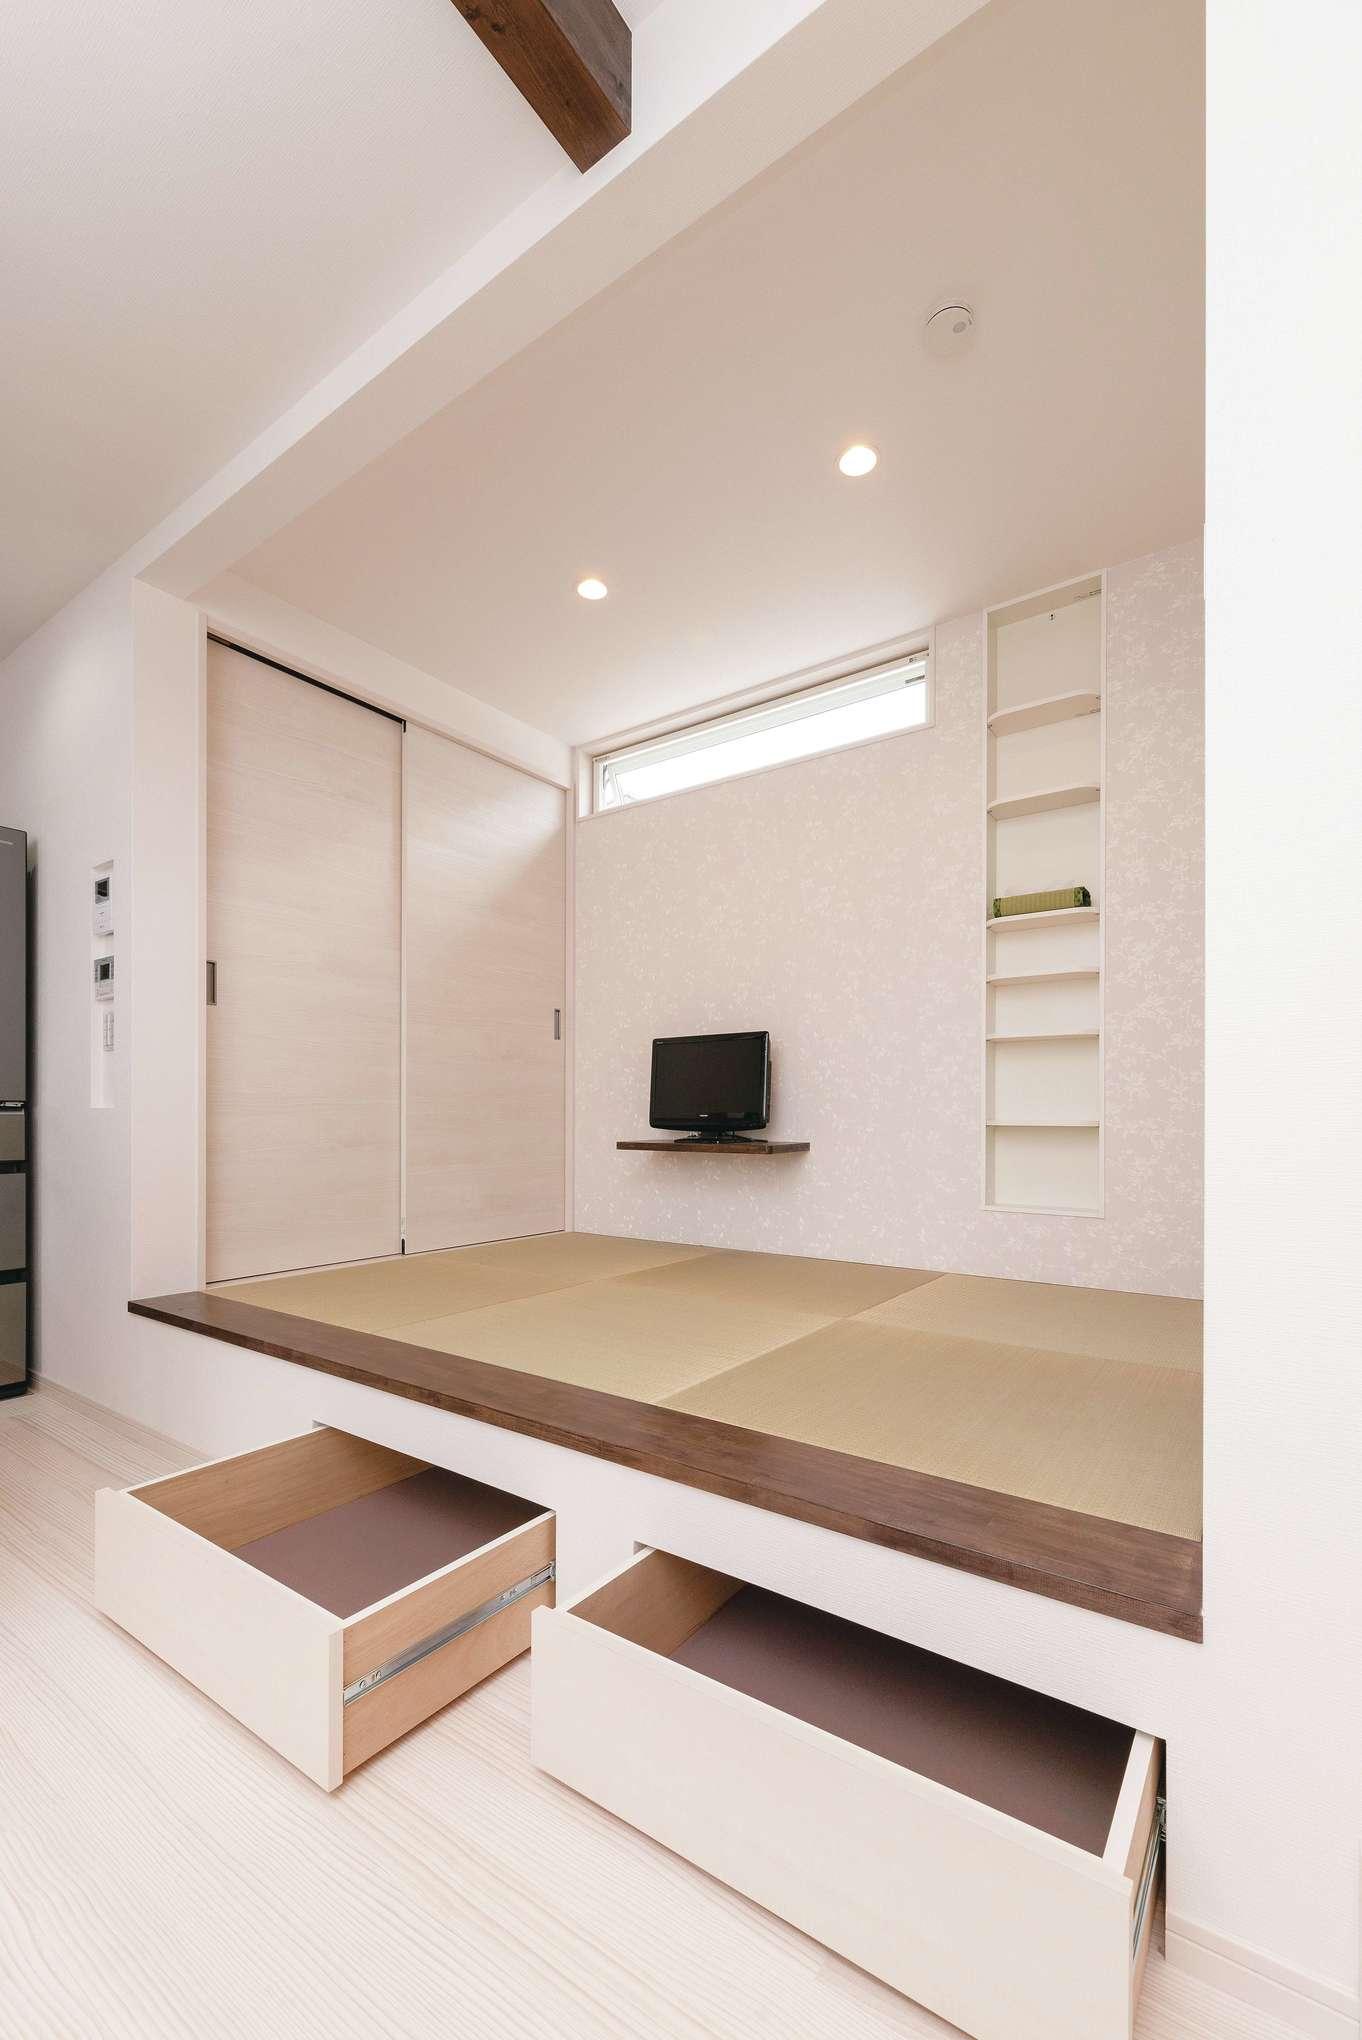 R+house沼津・伊東(HOUSE PLAN)【子育て、収納力、間取り】リビングの小上がりの下部は収納になっている